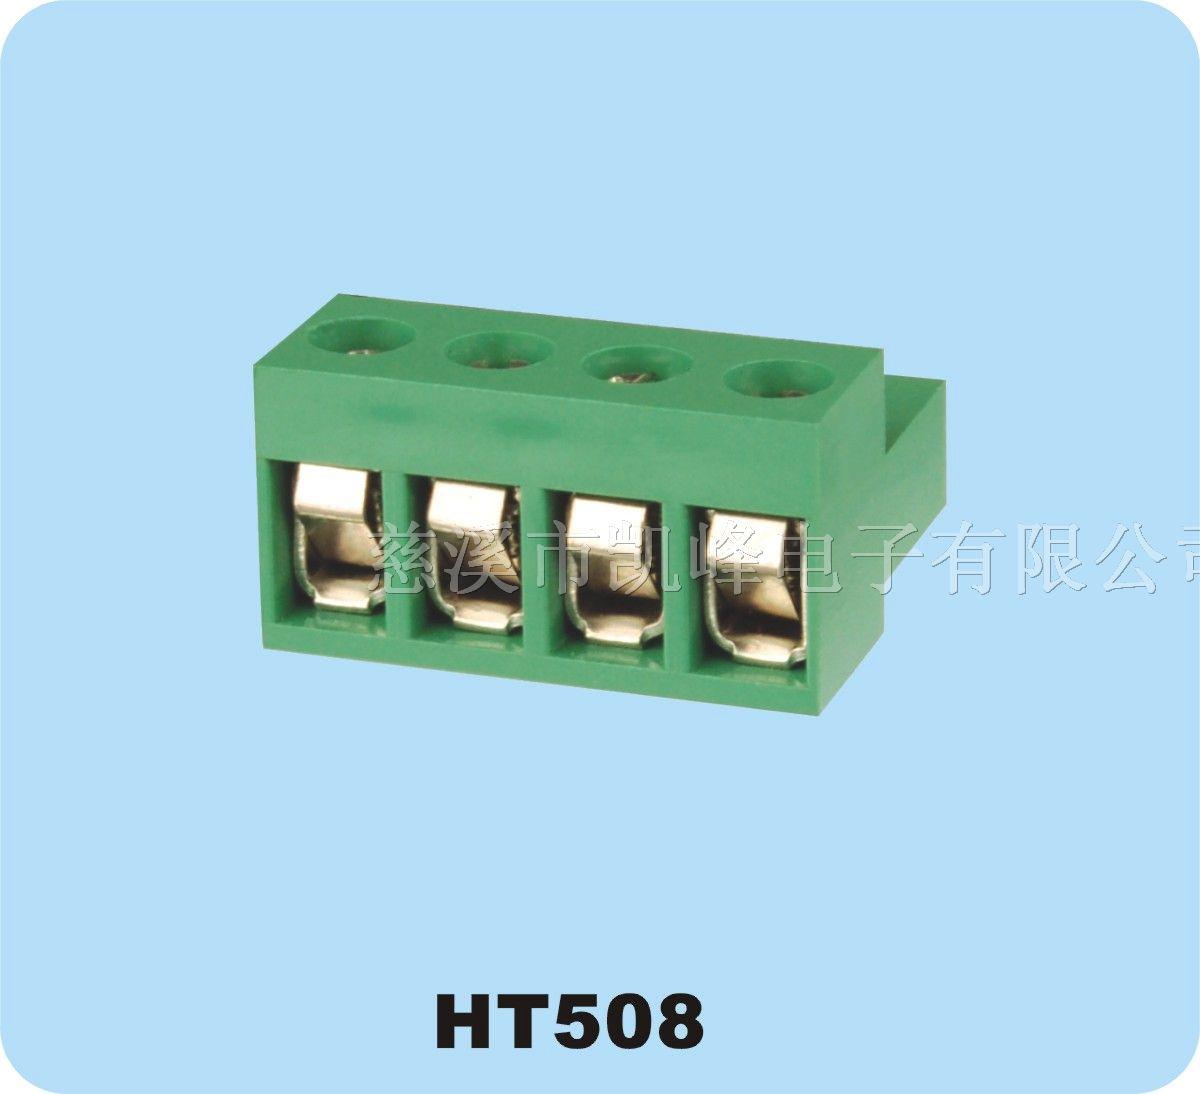 Pitch:5.08mm 材质及电镀 螺丝:M2.5,钢,镀锌 触点材料:磷青铜 塑件:PA66, UL94V-0 电气性能 额定电压:300V 额定电流:15A 接触电阻:20m? 绝缘电阻:5000M?/1000V 耐电压:AC1500V/1Min 使用线径:28-12AWG 2.5mm² 机械性能 温度范围:-40ºC~+105ºC 瞬时温度:+250ºC 5秒 扭距:0.